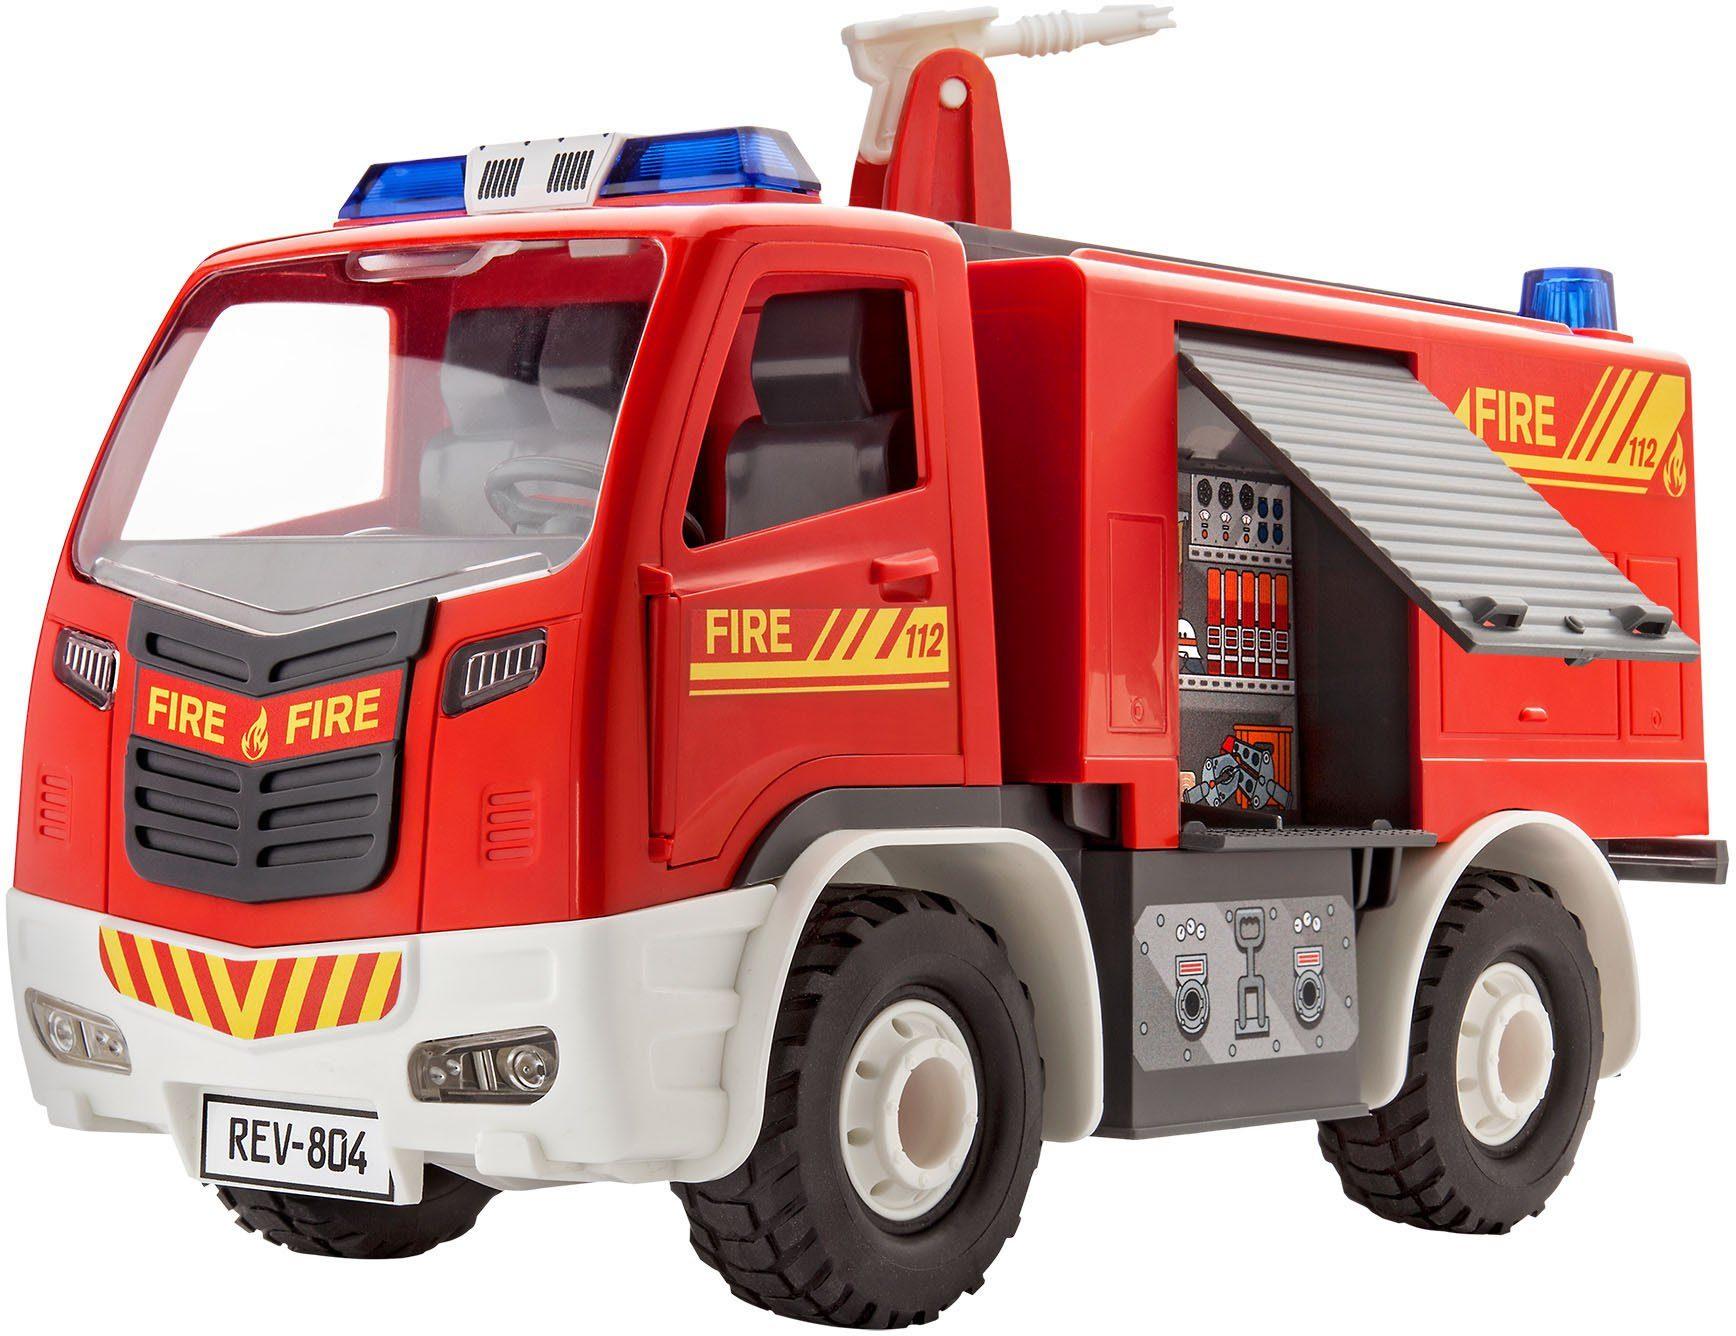 Revell® Modellbausatz Feuerwehr, Maßstab 1:20, »Junior Kit Fire Truck«